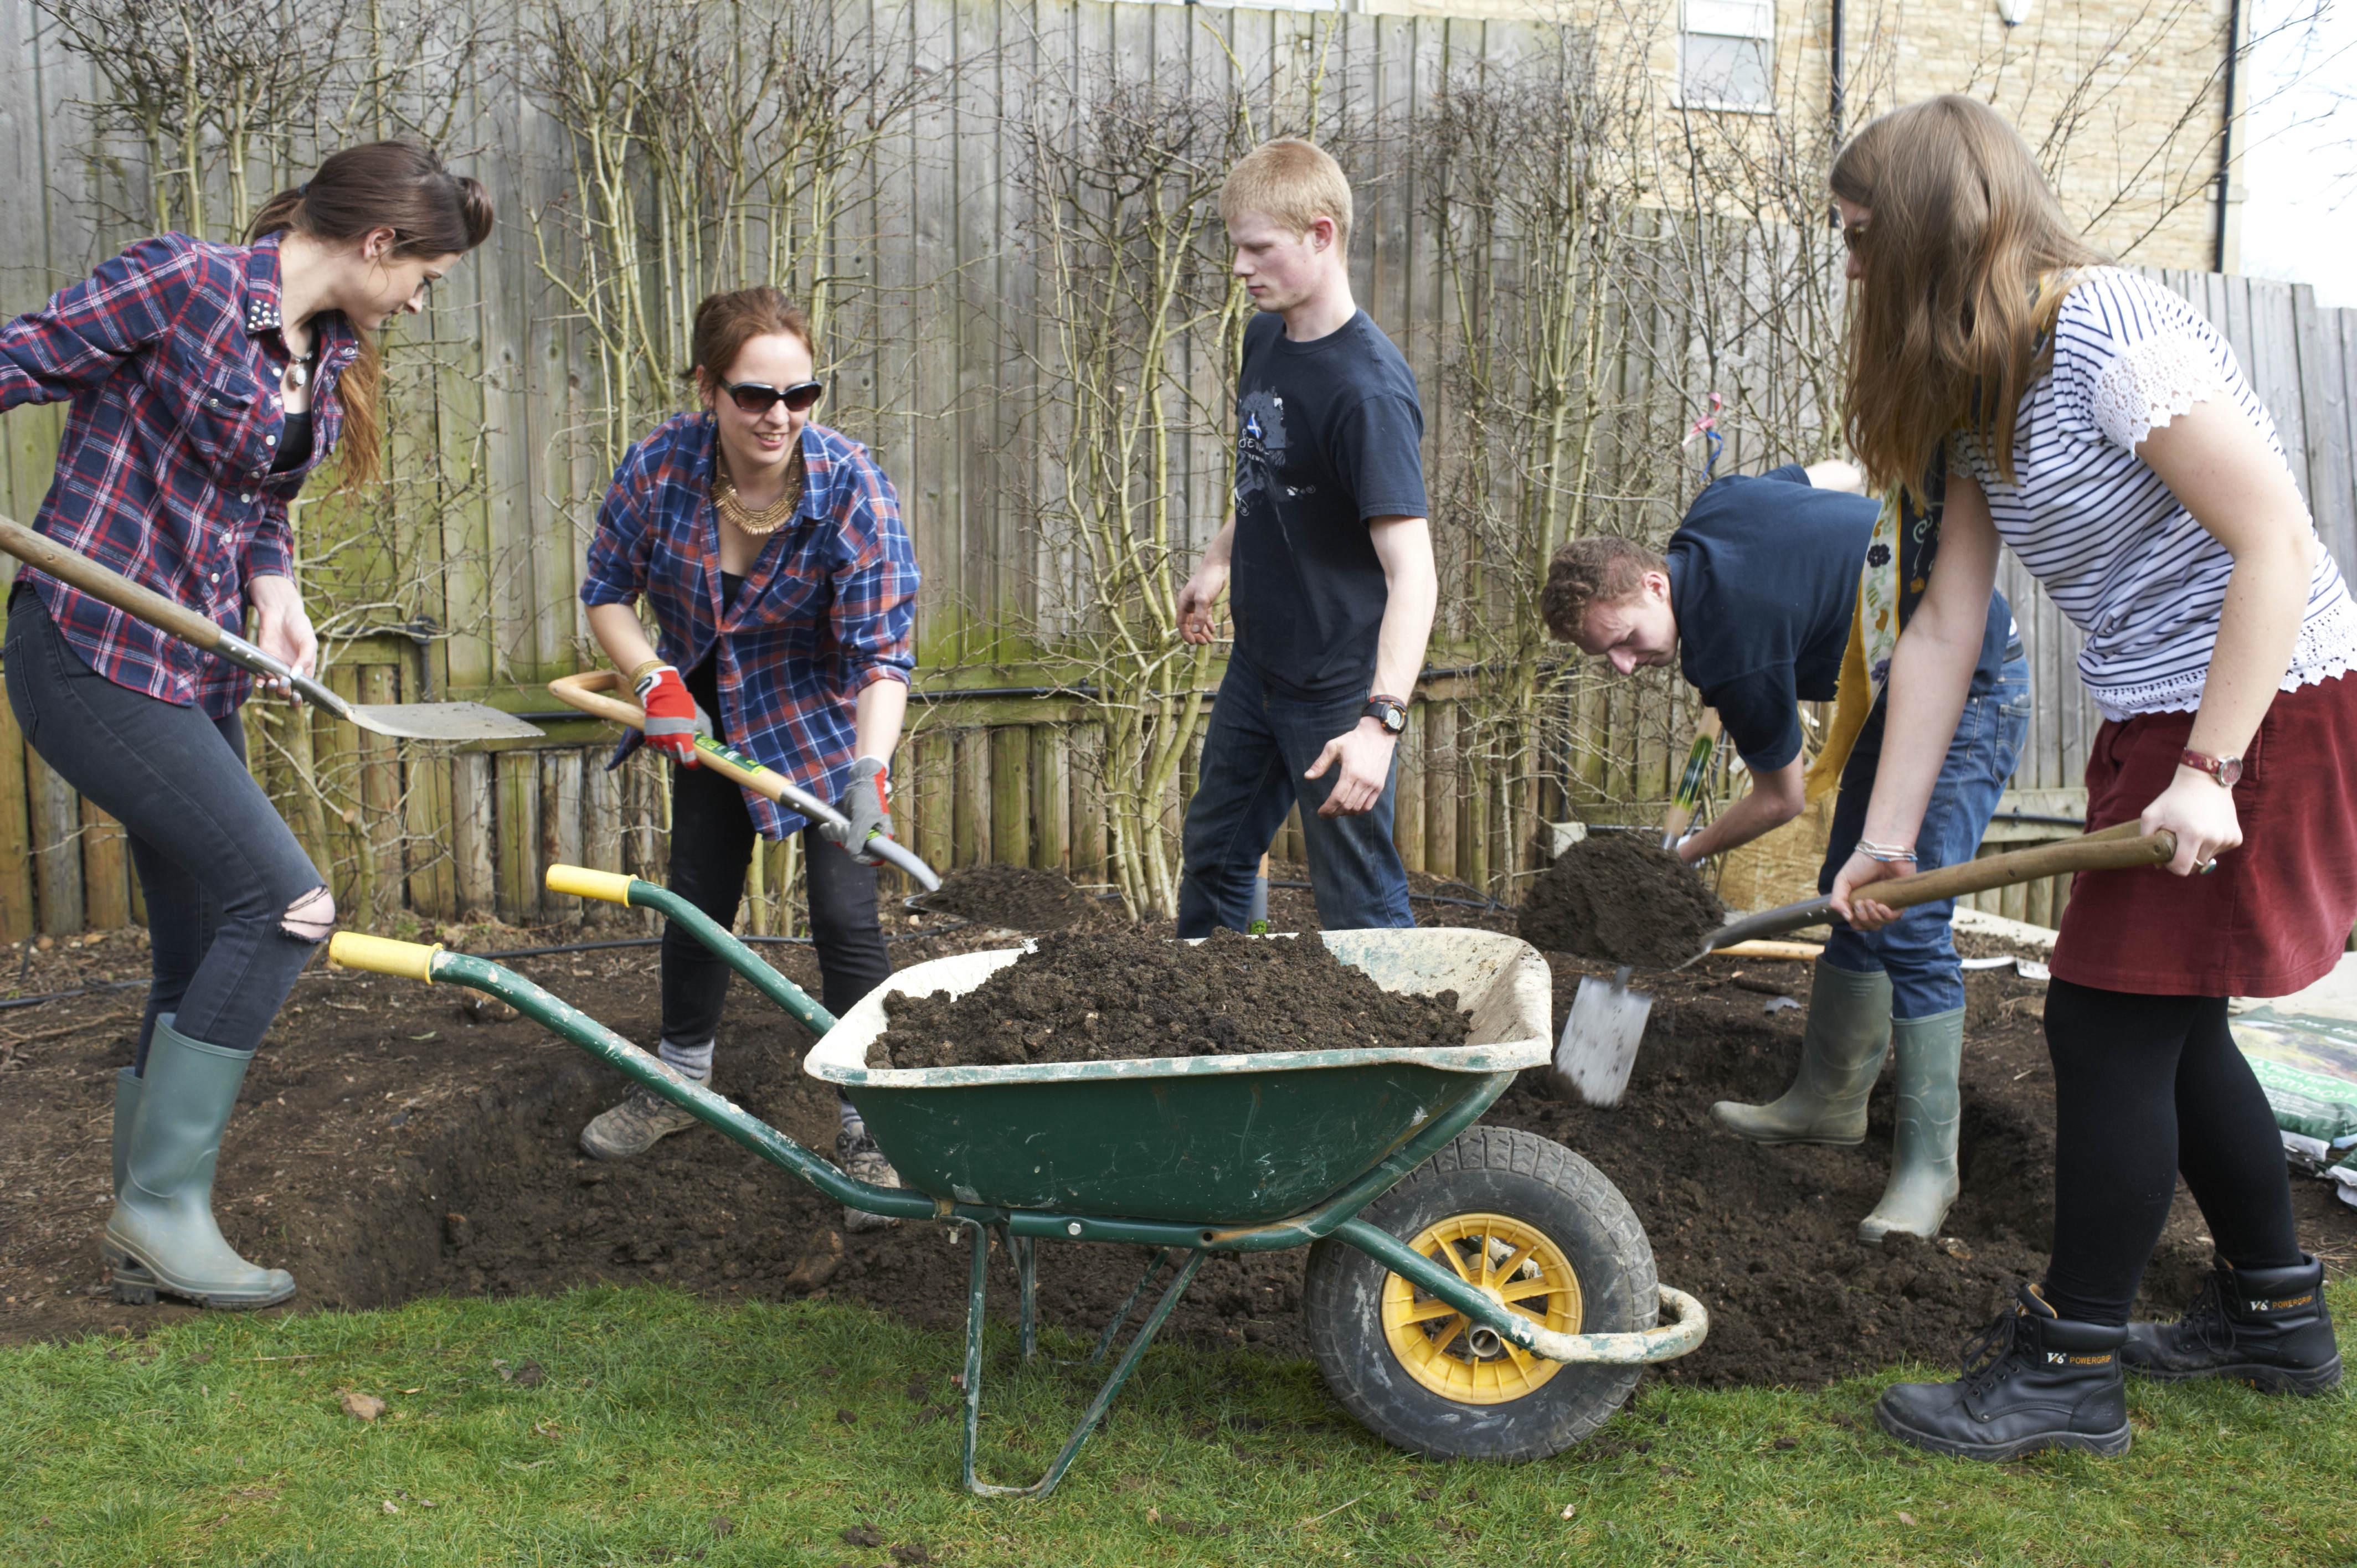 Epr retail news homebase the garden academy returns for for Gardening qualifications